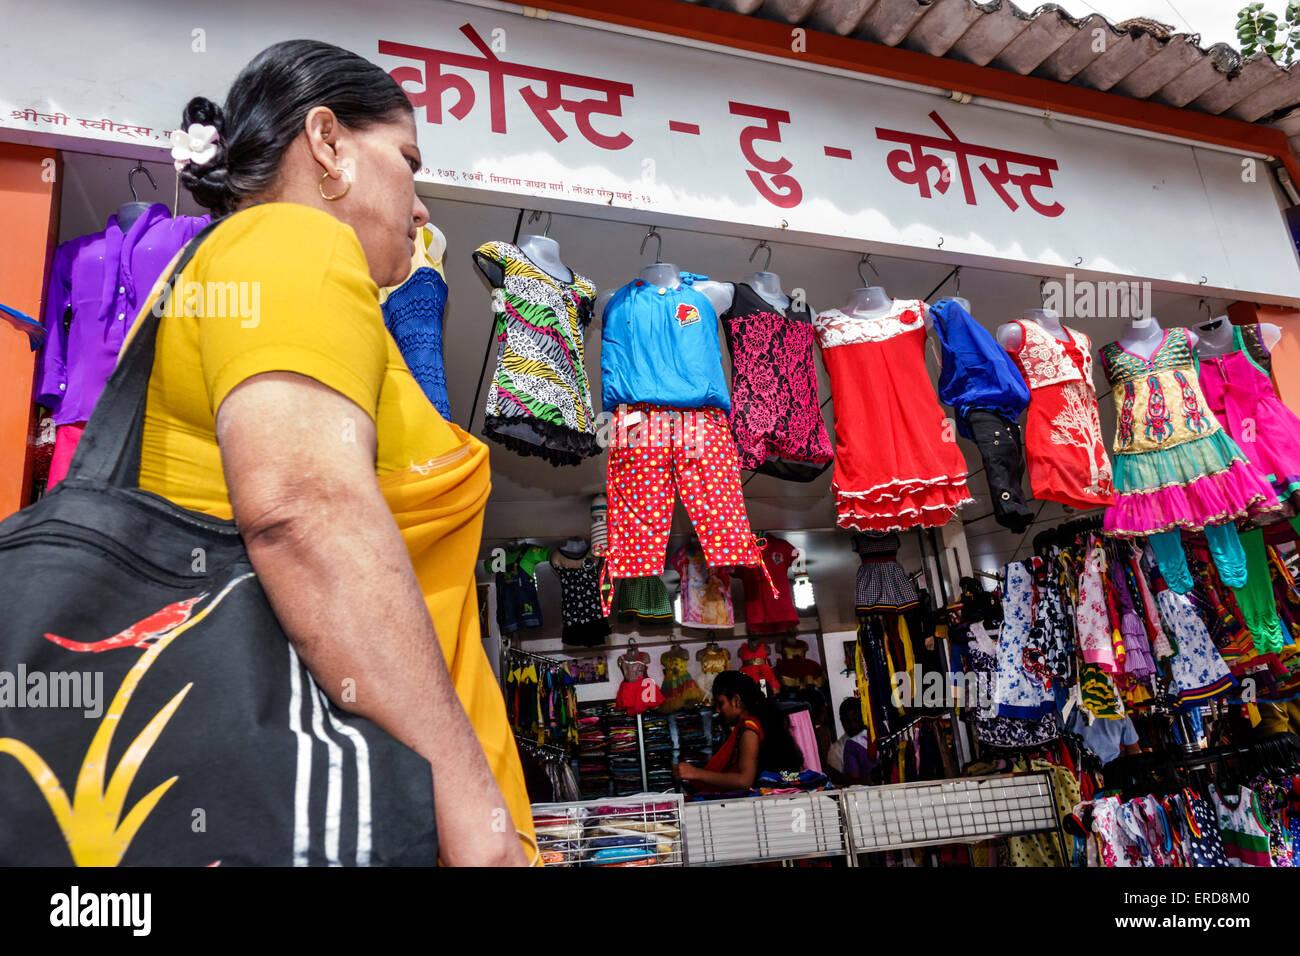 Mumbai India Asian Lower Parel Sunday Market shopping selling sale woman Hindi children's clothing store business Stock Photo